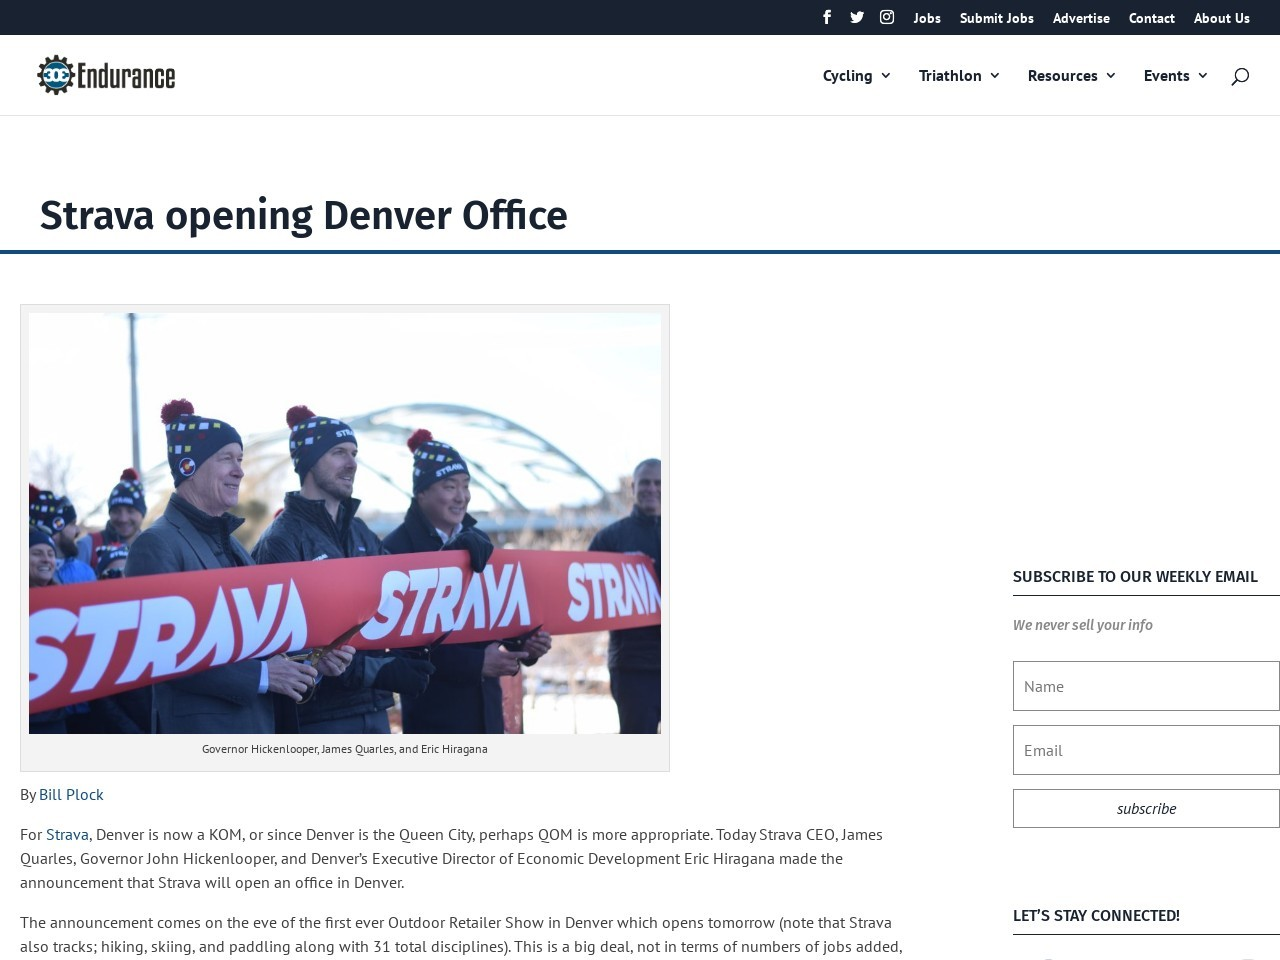 Strava opening Denver Office